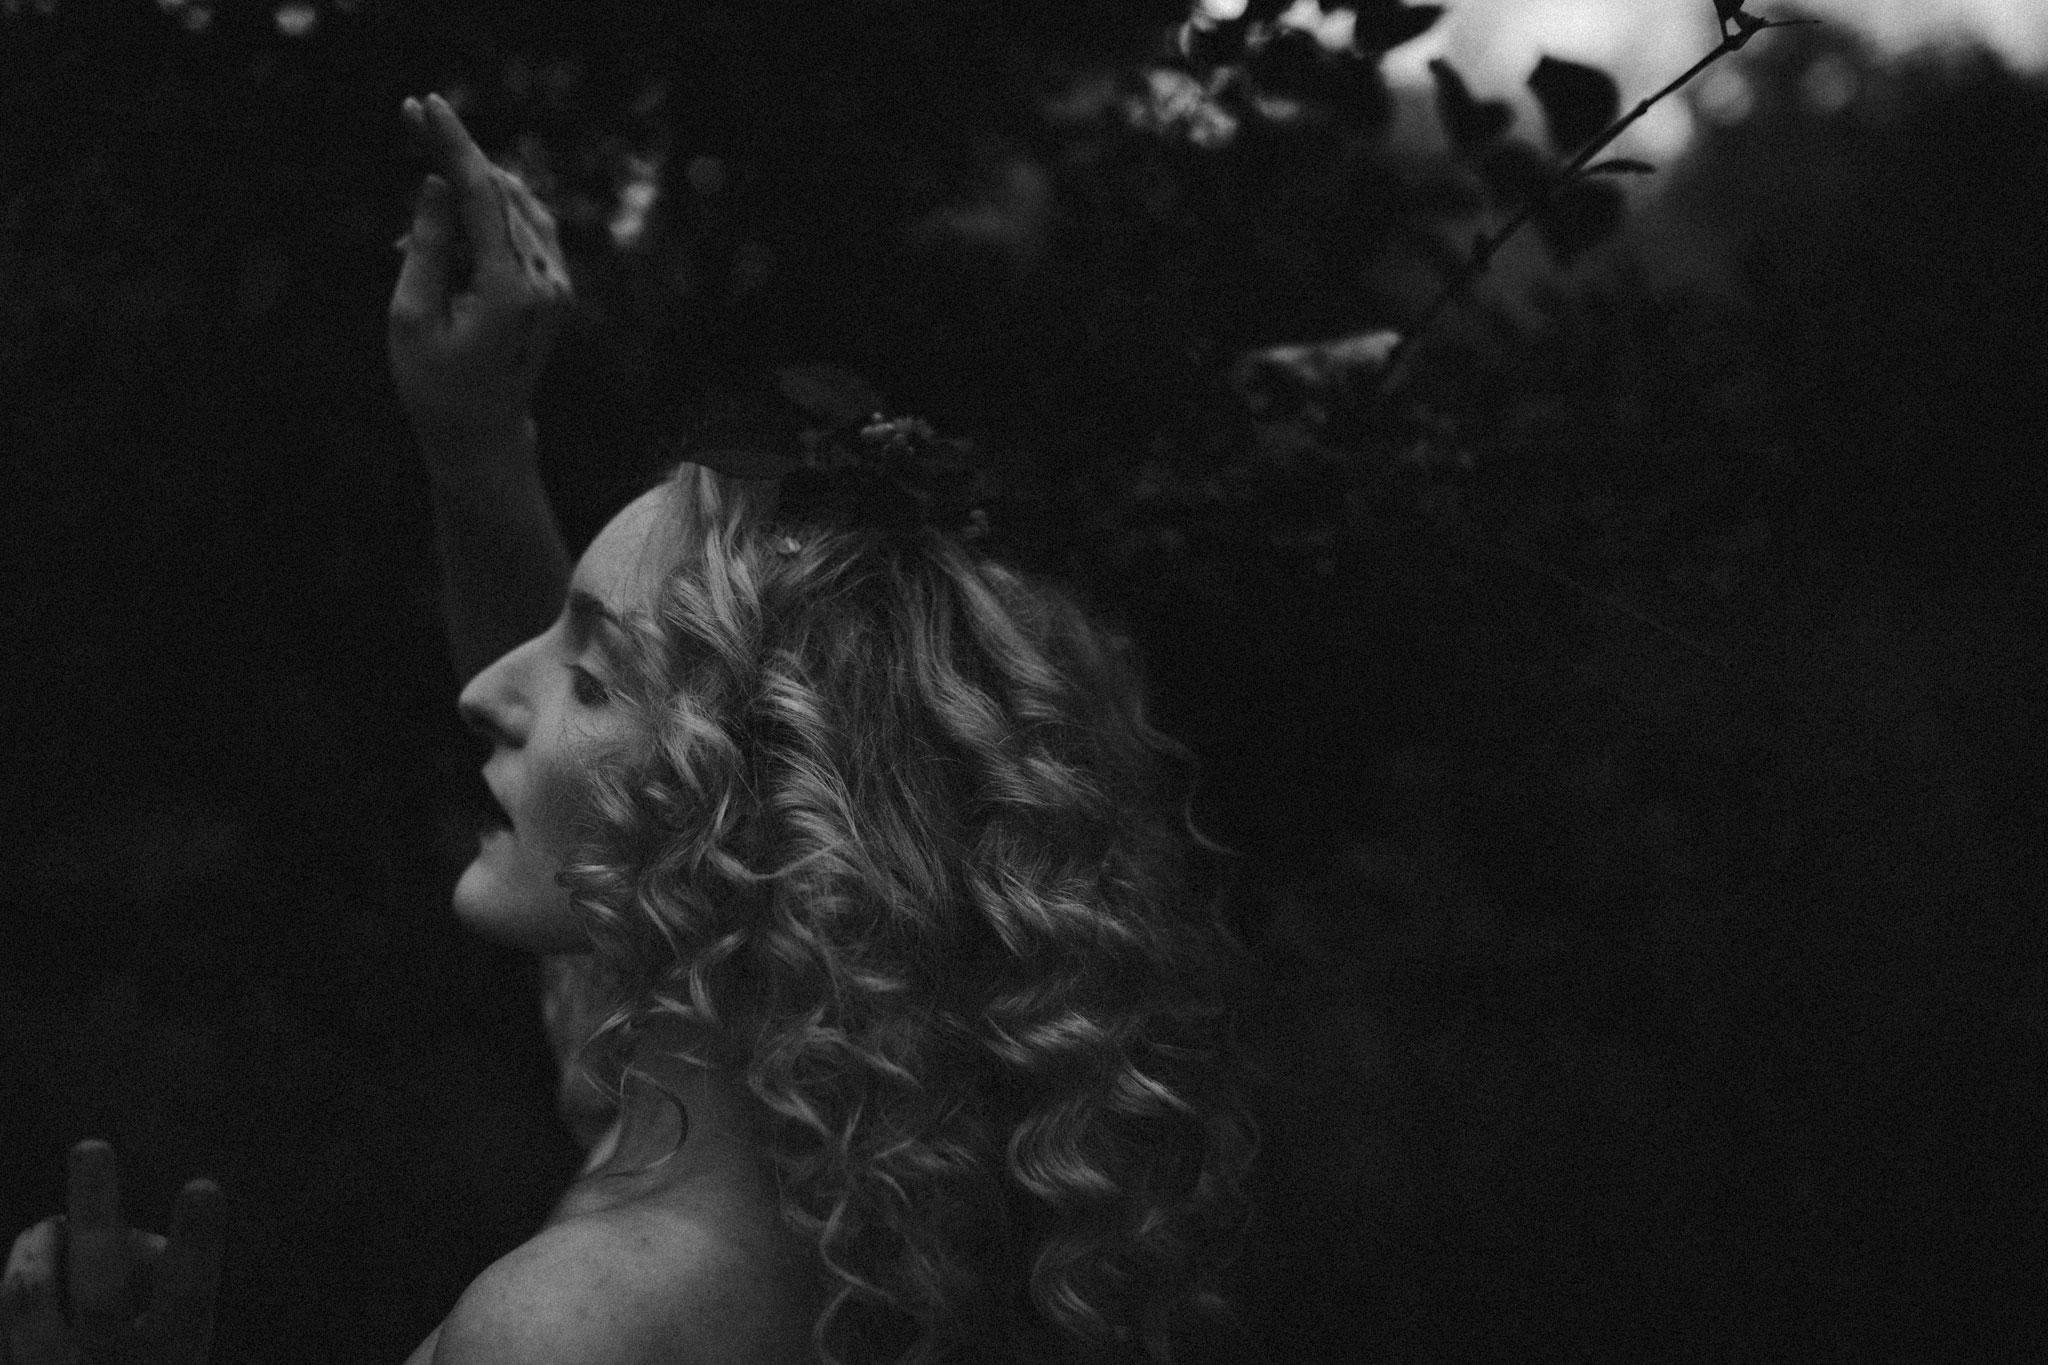 pale-witch-201fb.jpg